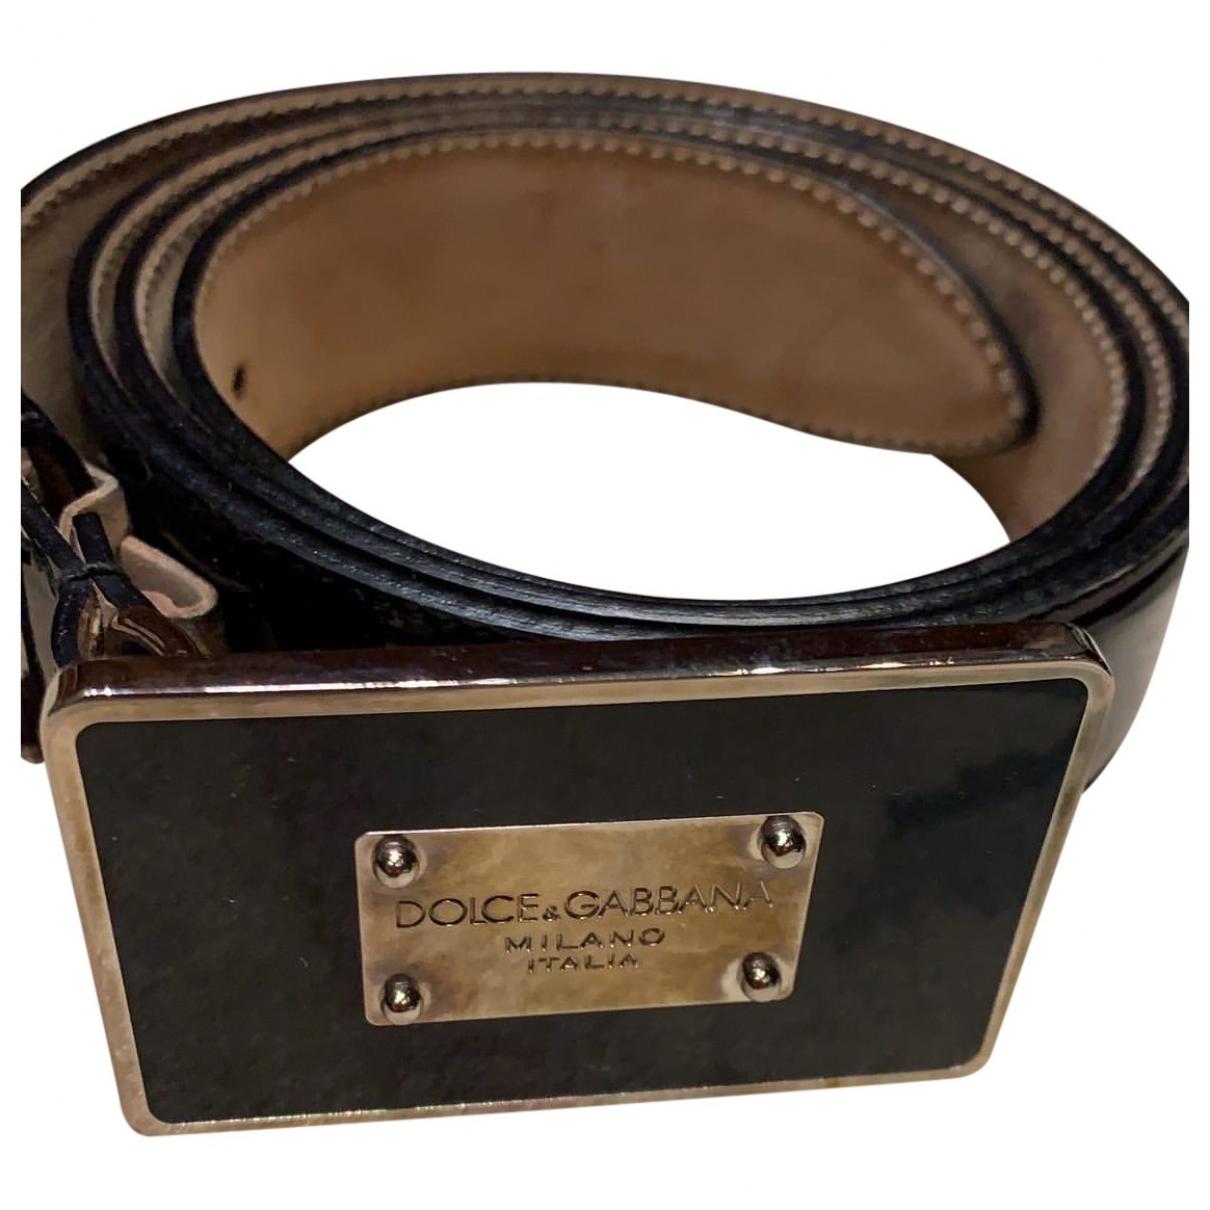 Dolce & Gabbana \N Black Patent leather belt for Women 80 cm